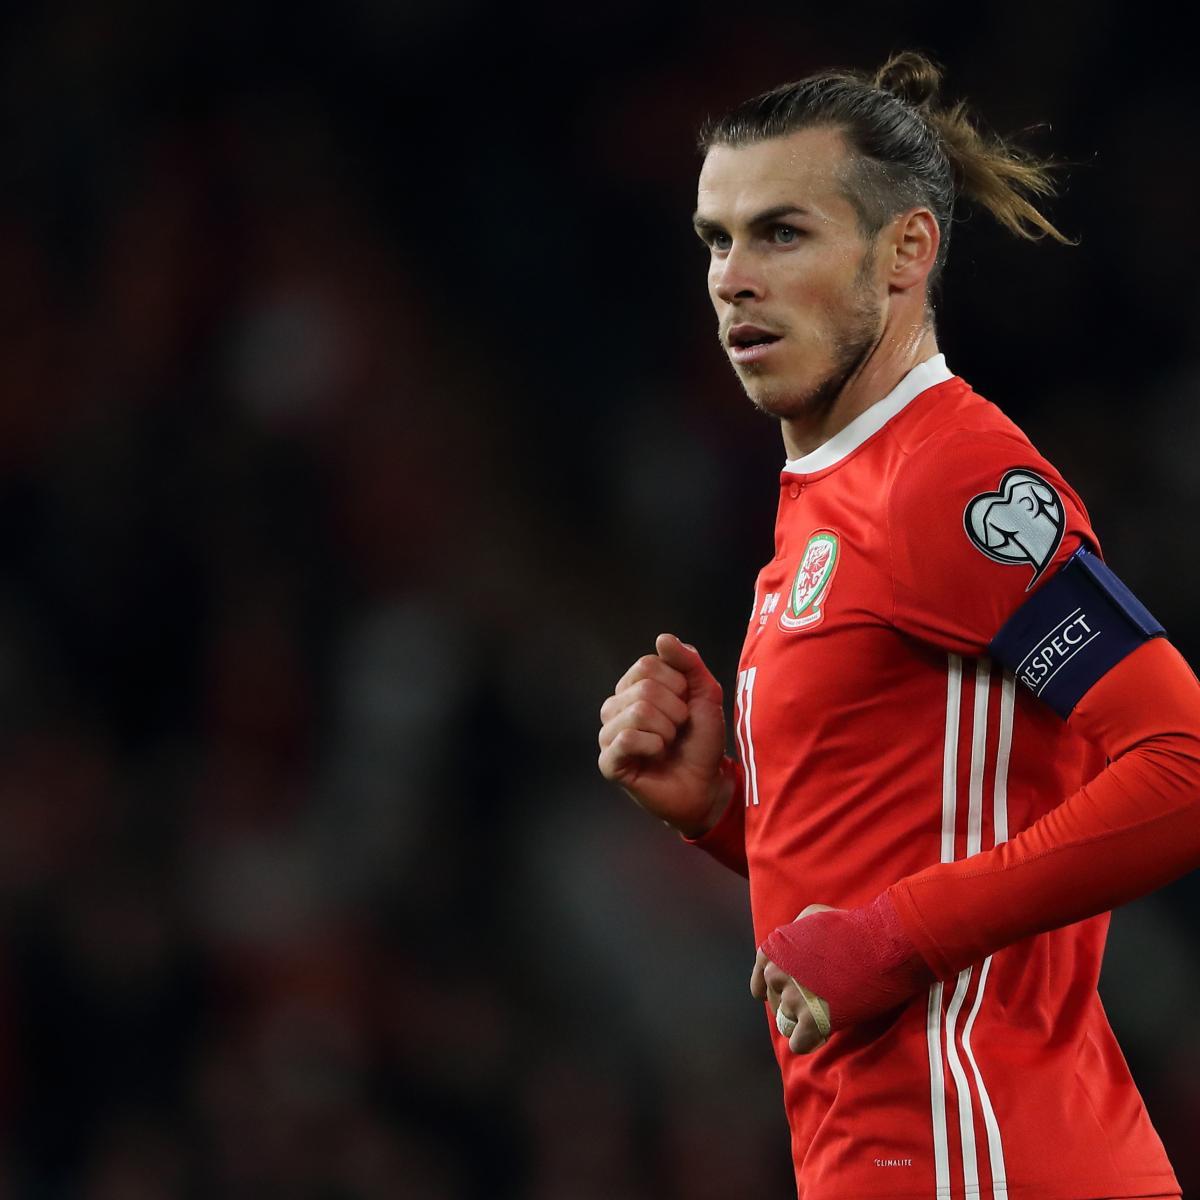 Gareth Bale Says 'Wales, Golf, Real Madrid' Song 'A Good Bit of Fun'